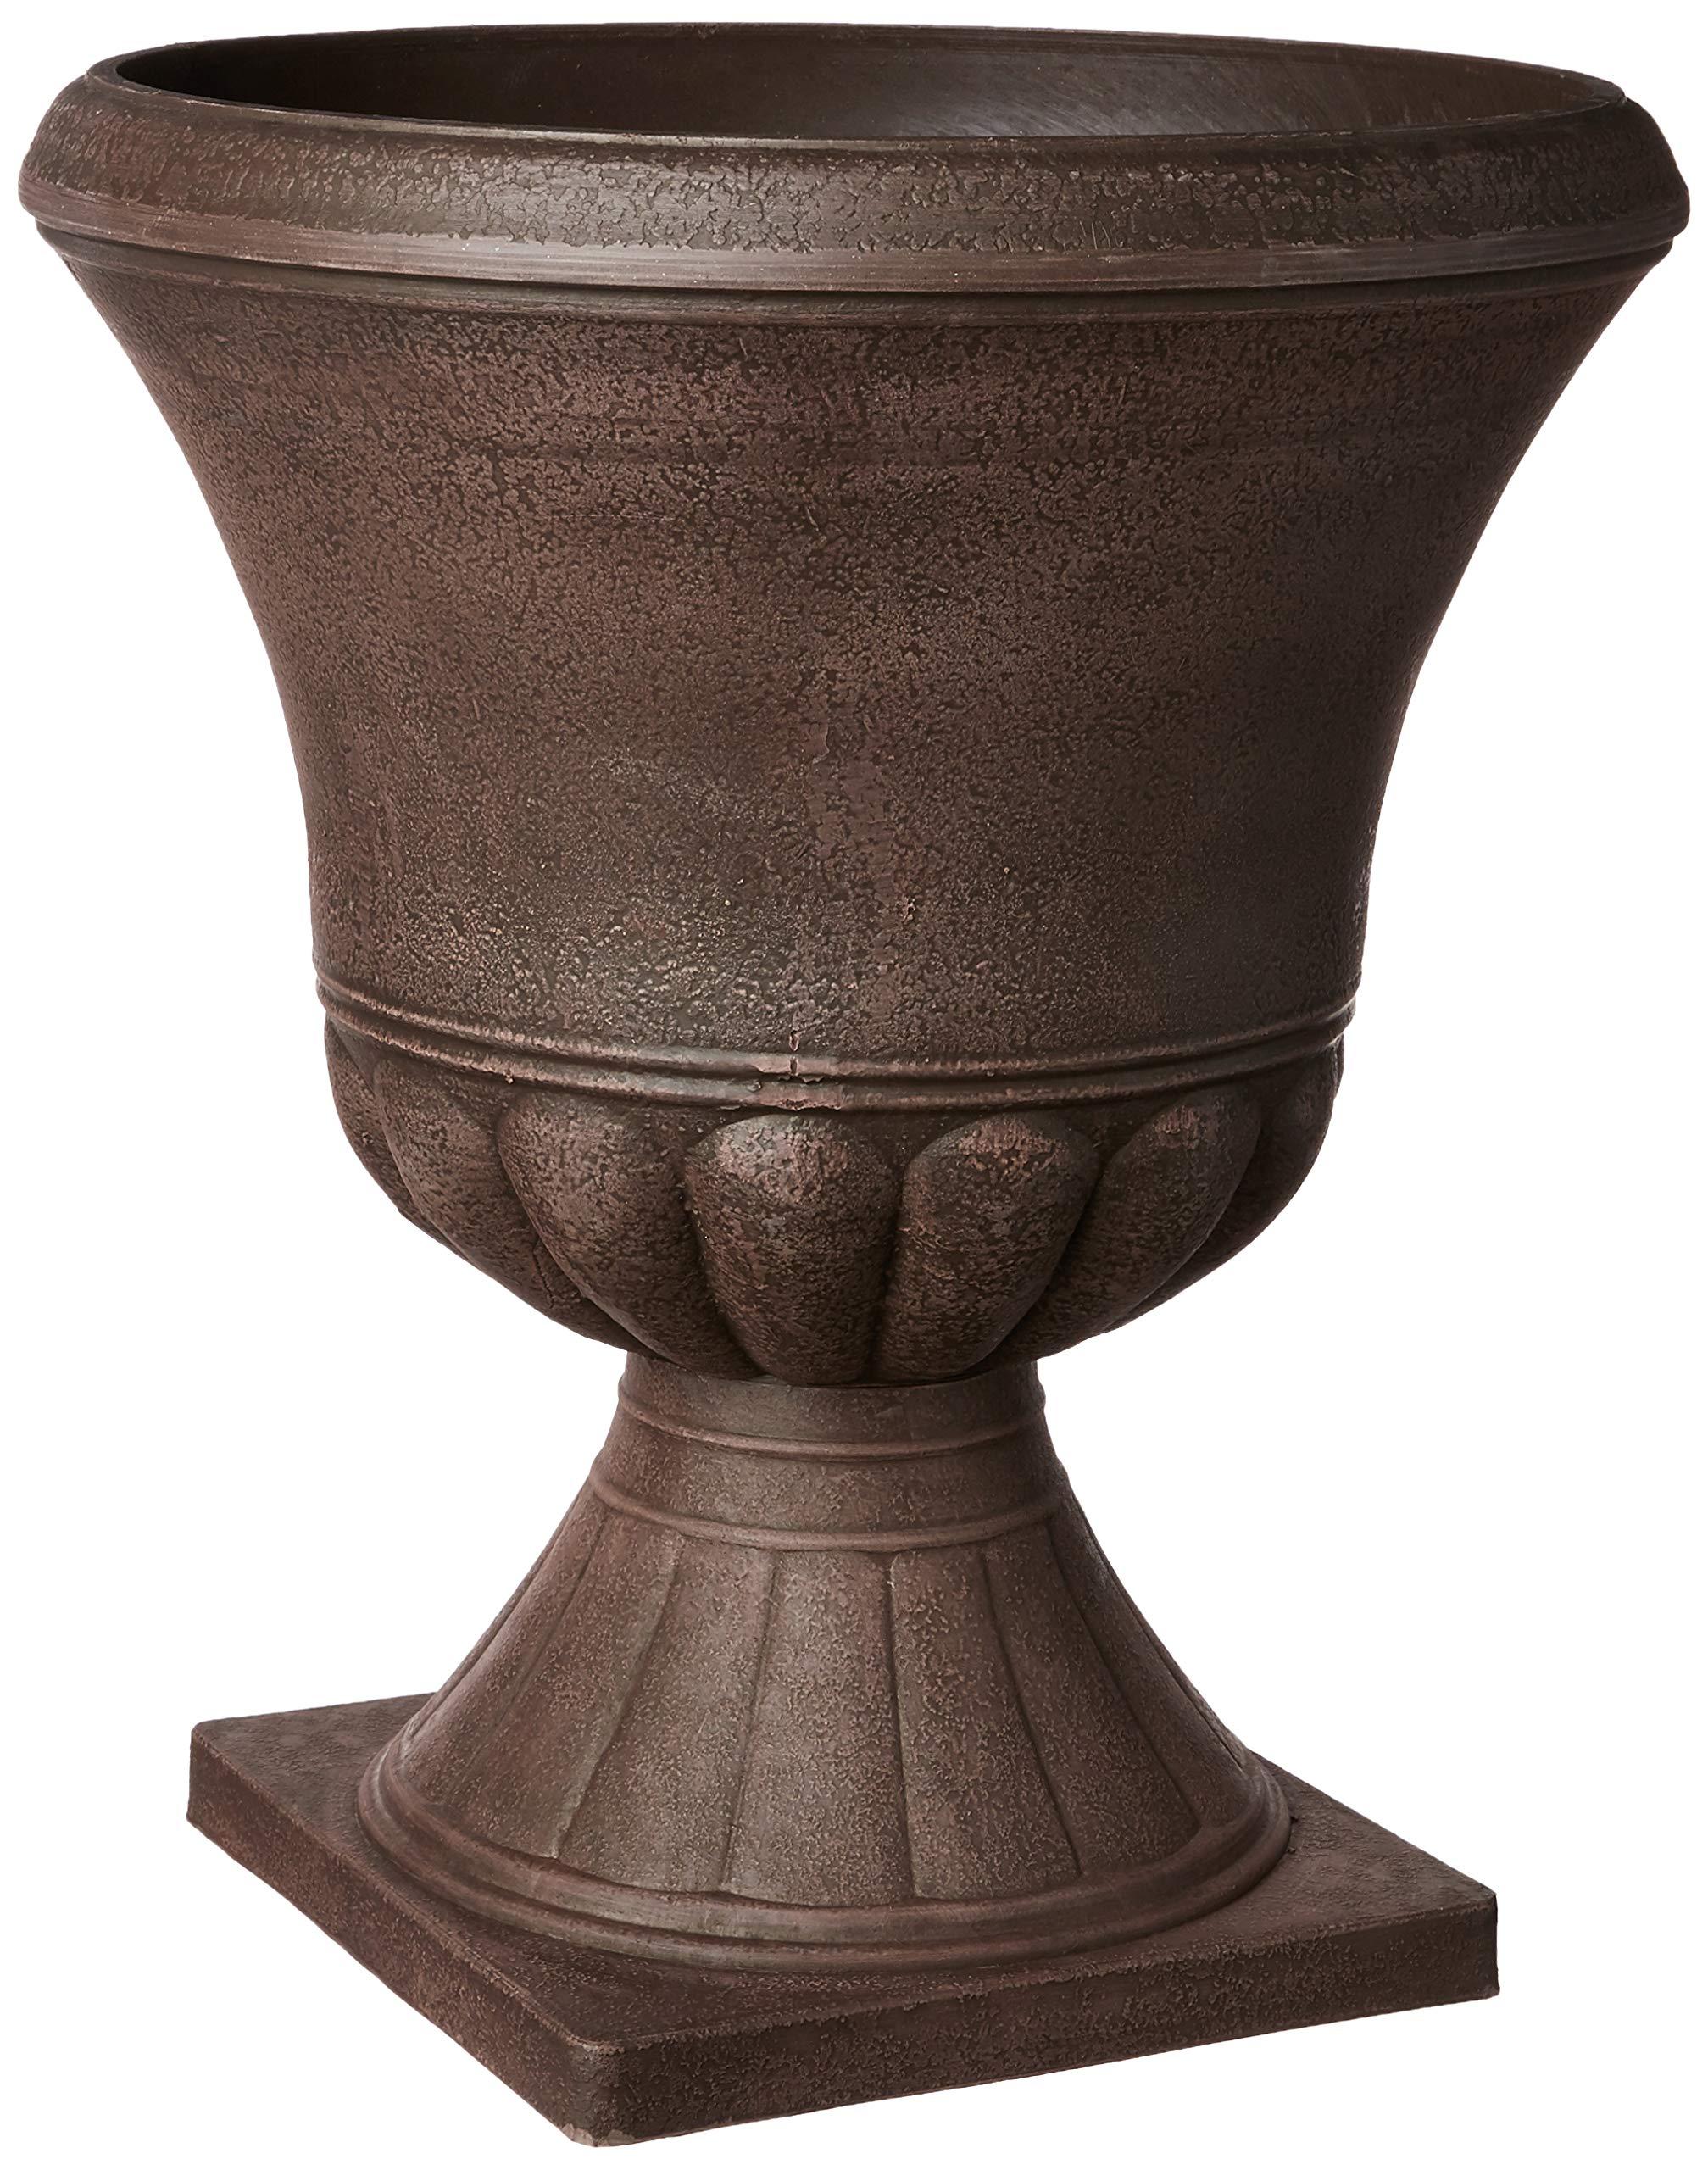 Arcadia Garden Products PSW DB51C Hamilton Urn, 18 by 22'', Chocolate by Arcadia Garden Products (Image #1)